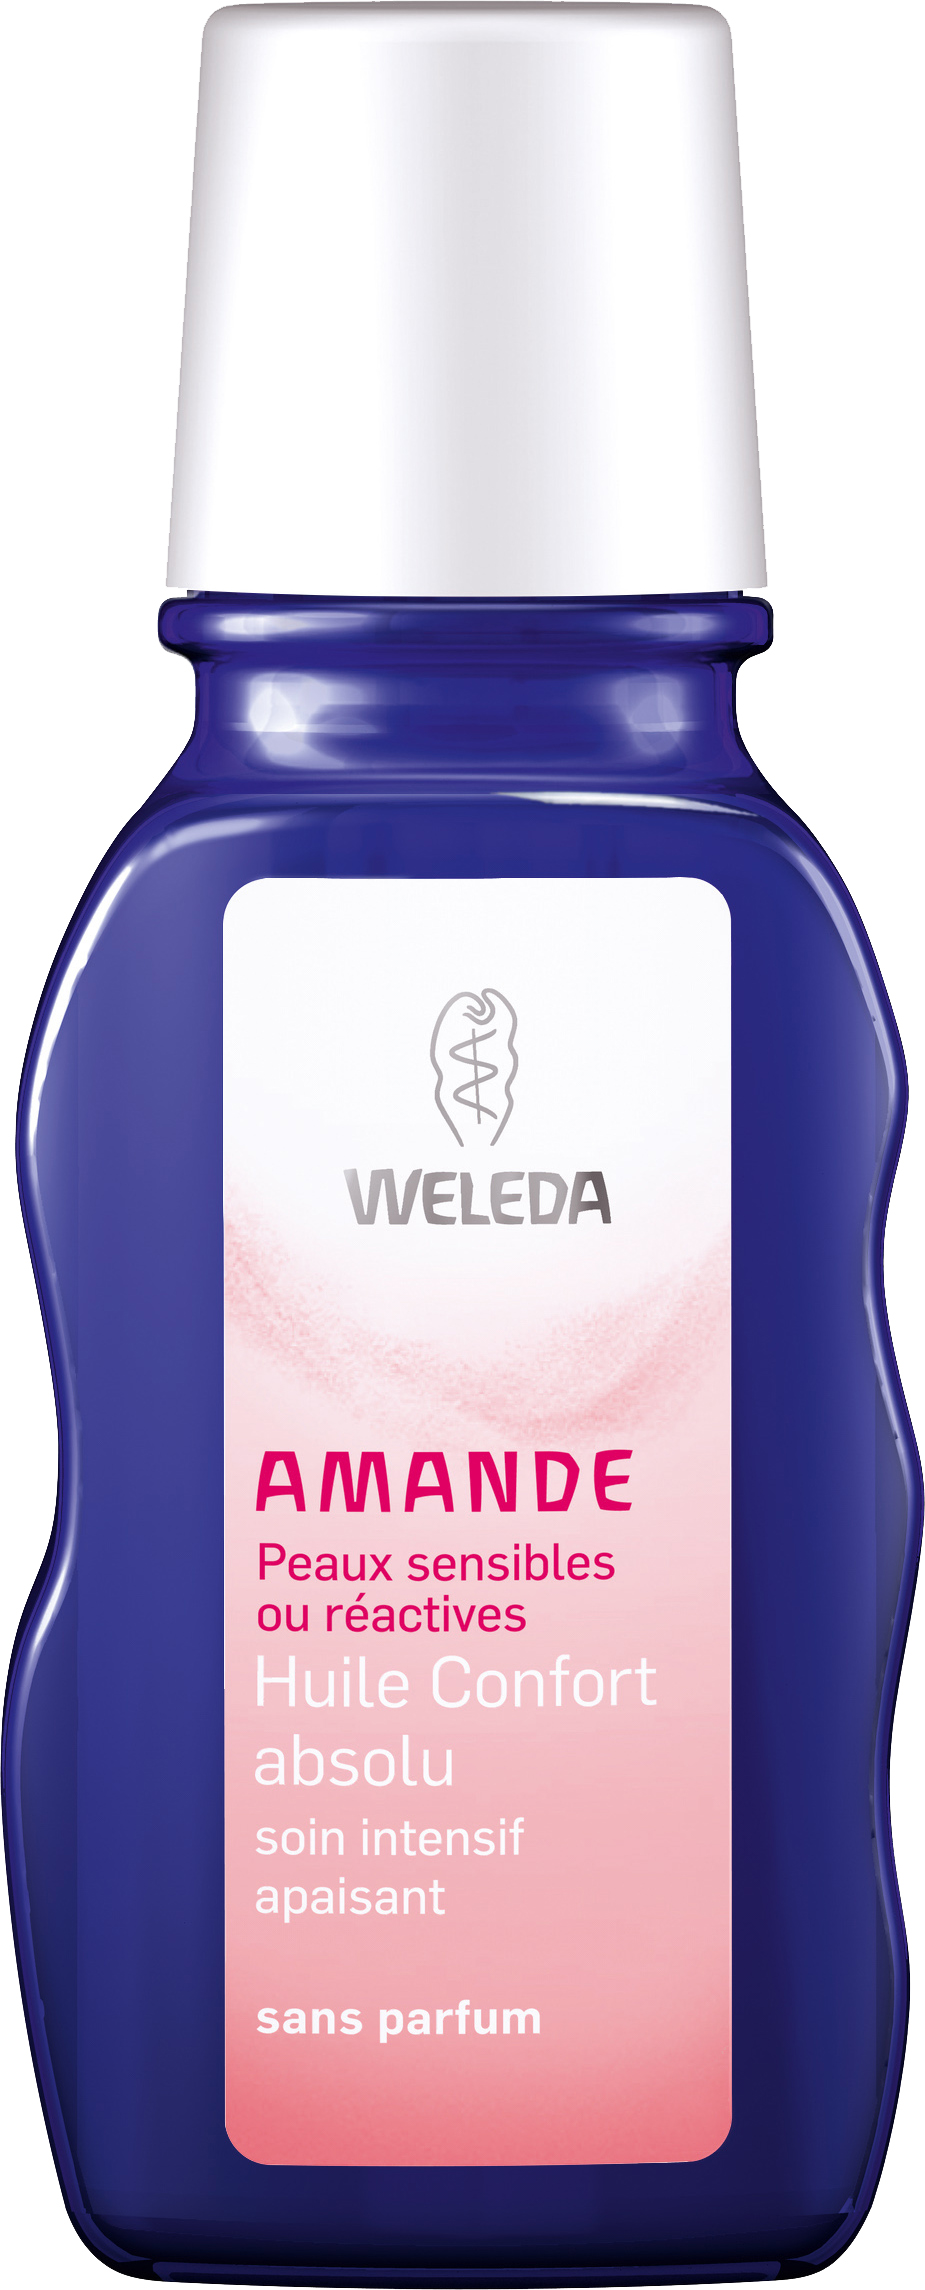 Doux Good - Weleda - Huile confort absolu amande